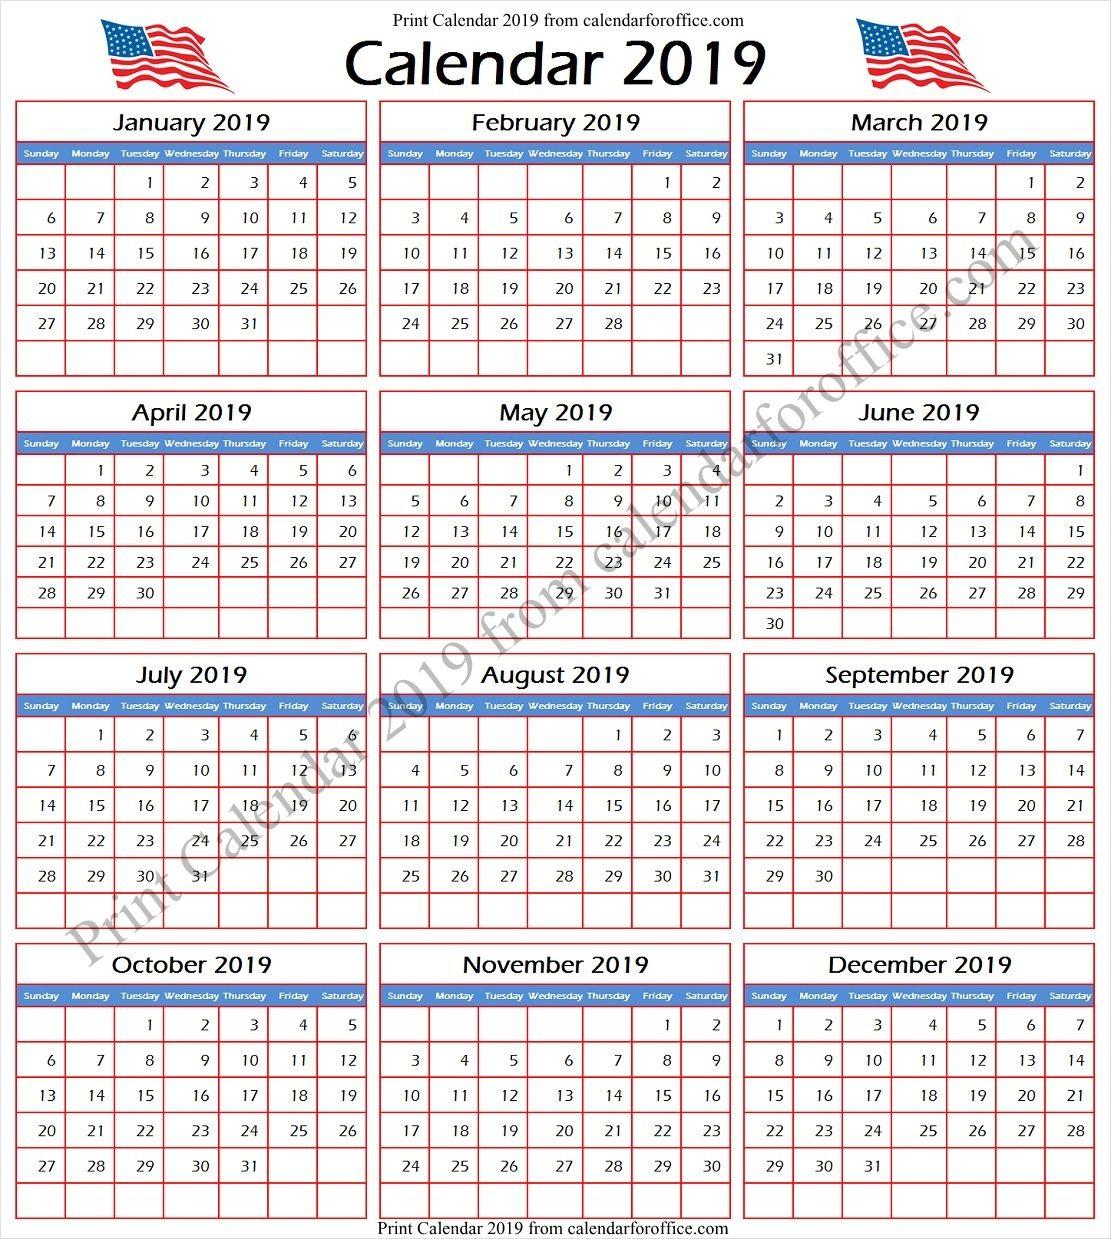 2019 calendar with federal holidays